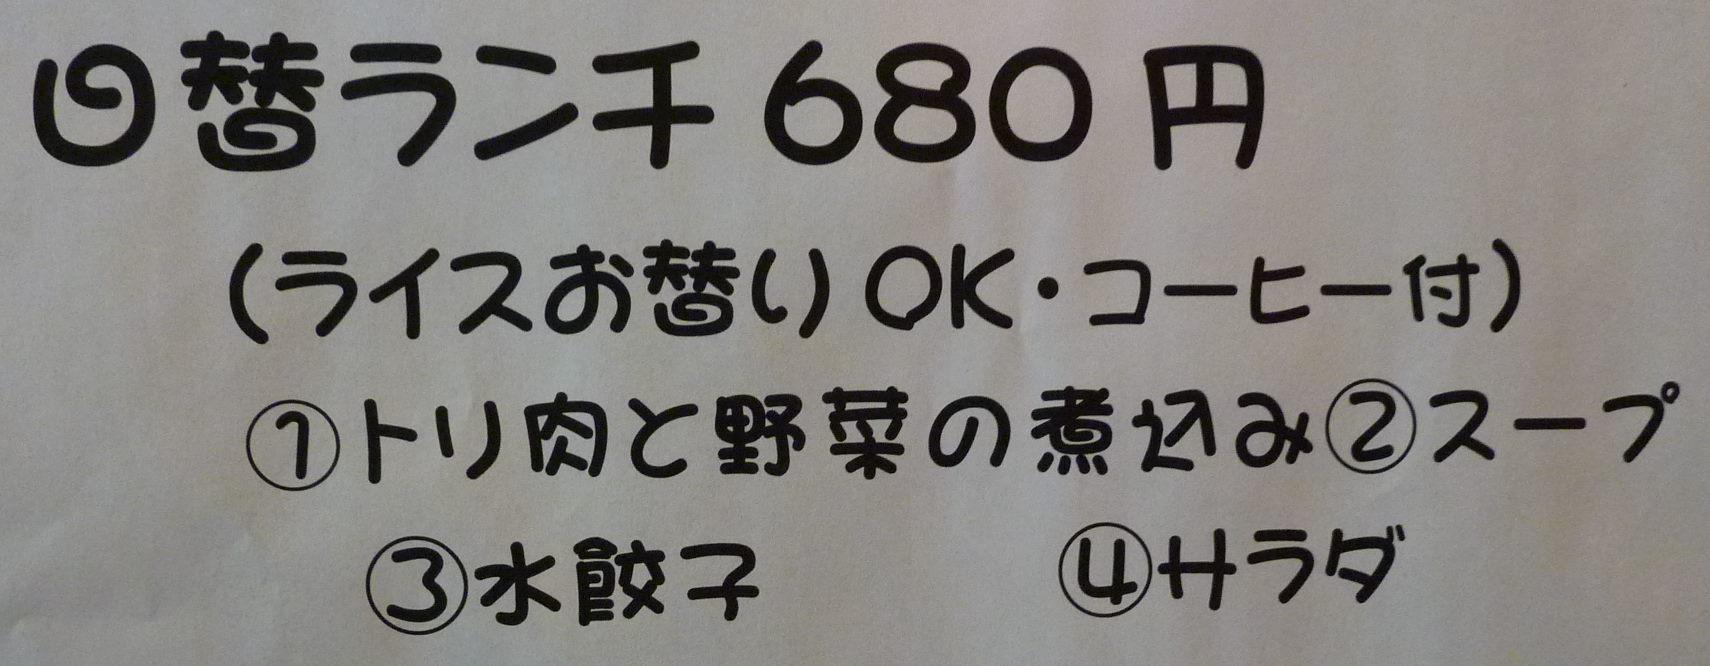 P1020693.JPG